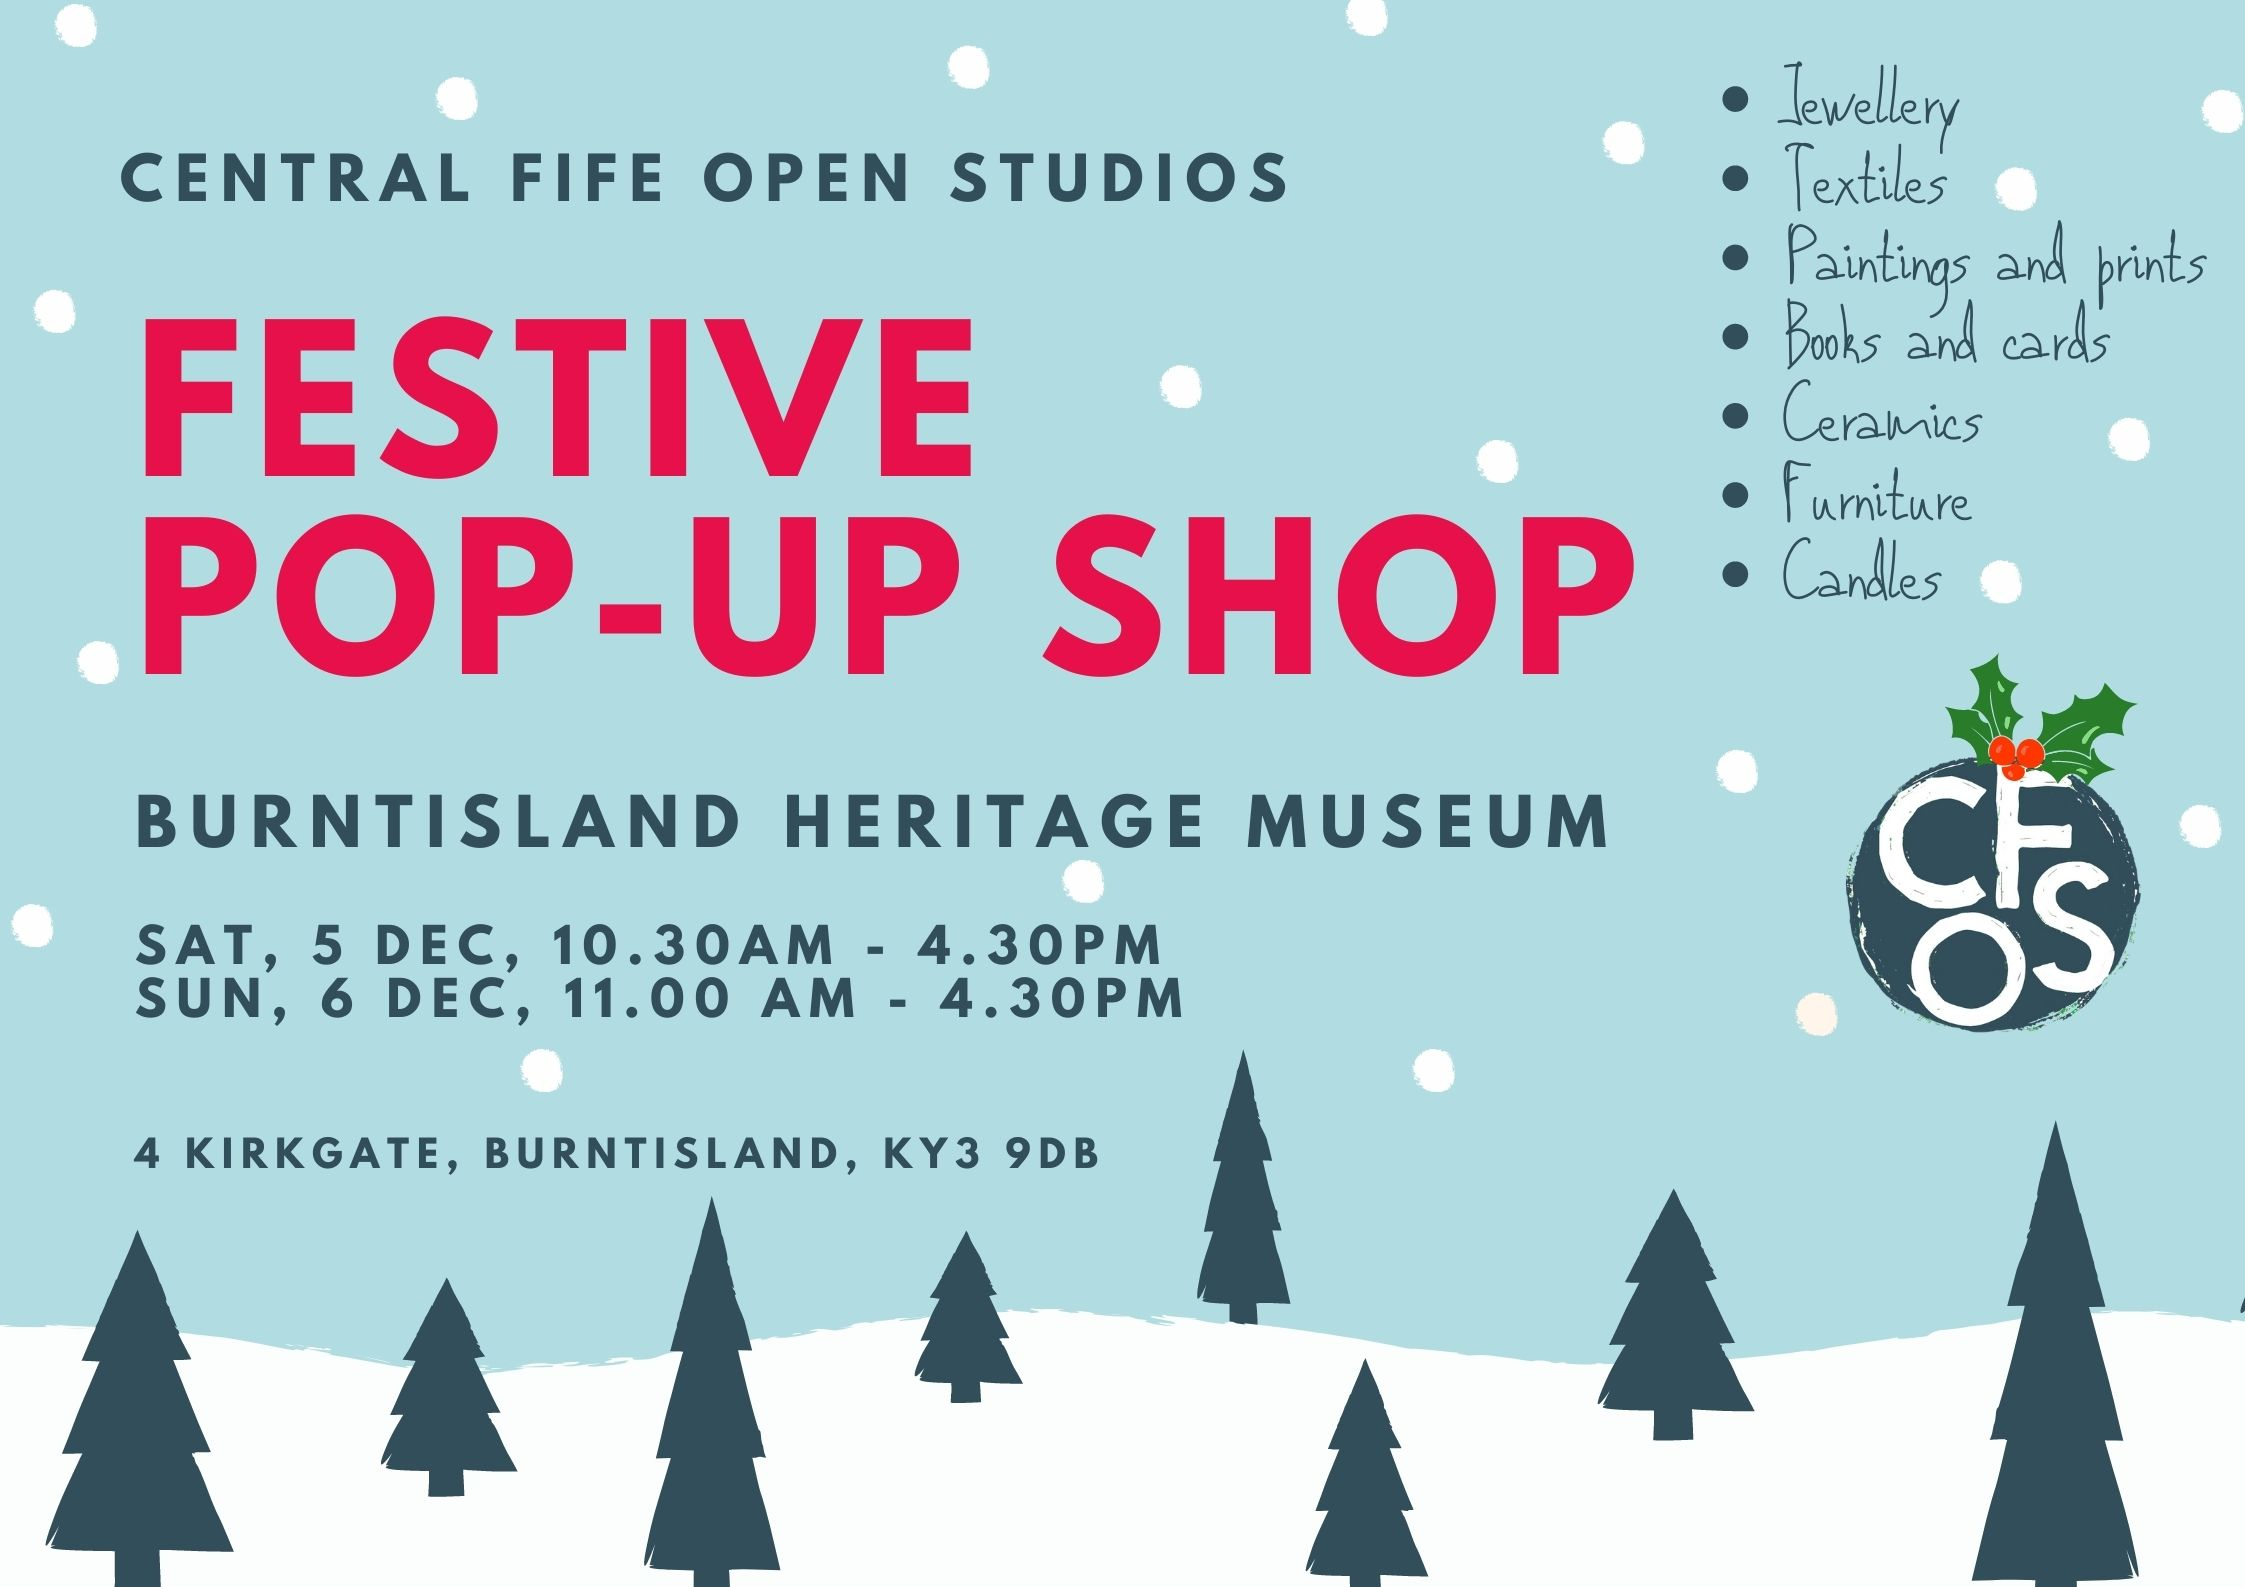 Central Fife Open Studios - Festive Pop Up Shop